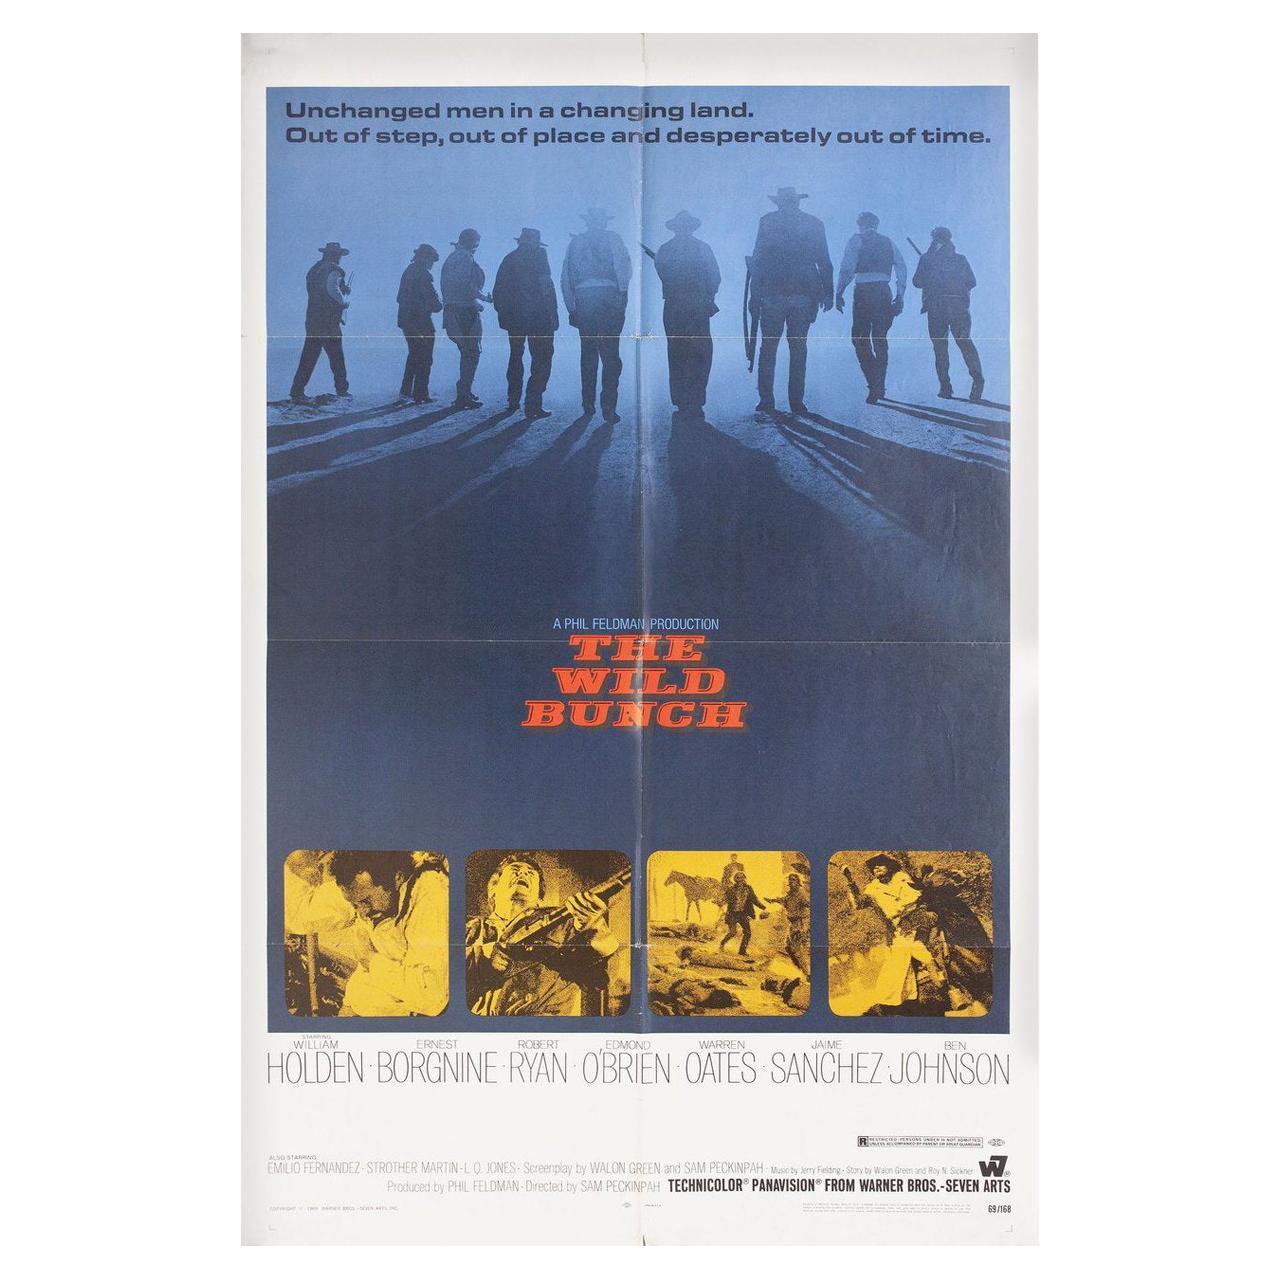 """The Wild Bunch"" 1969 U.S. One Sheet Film Poster"